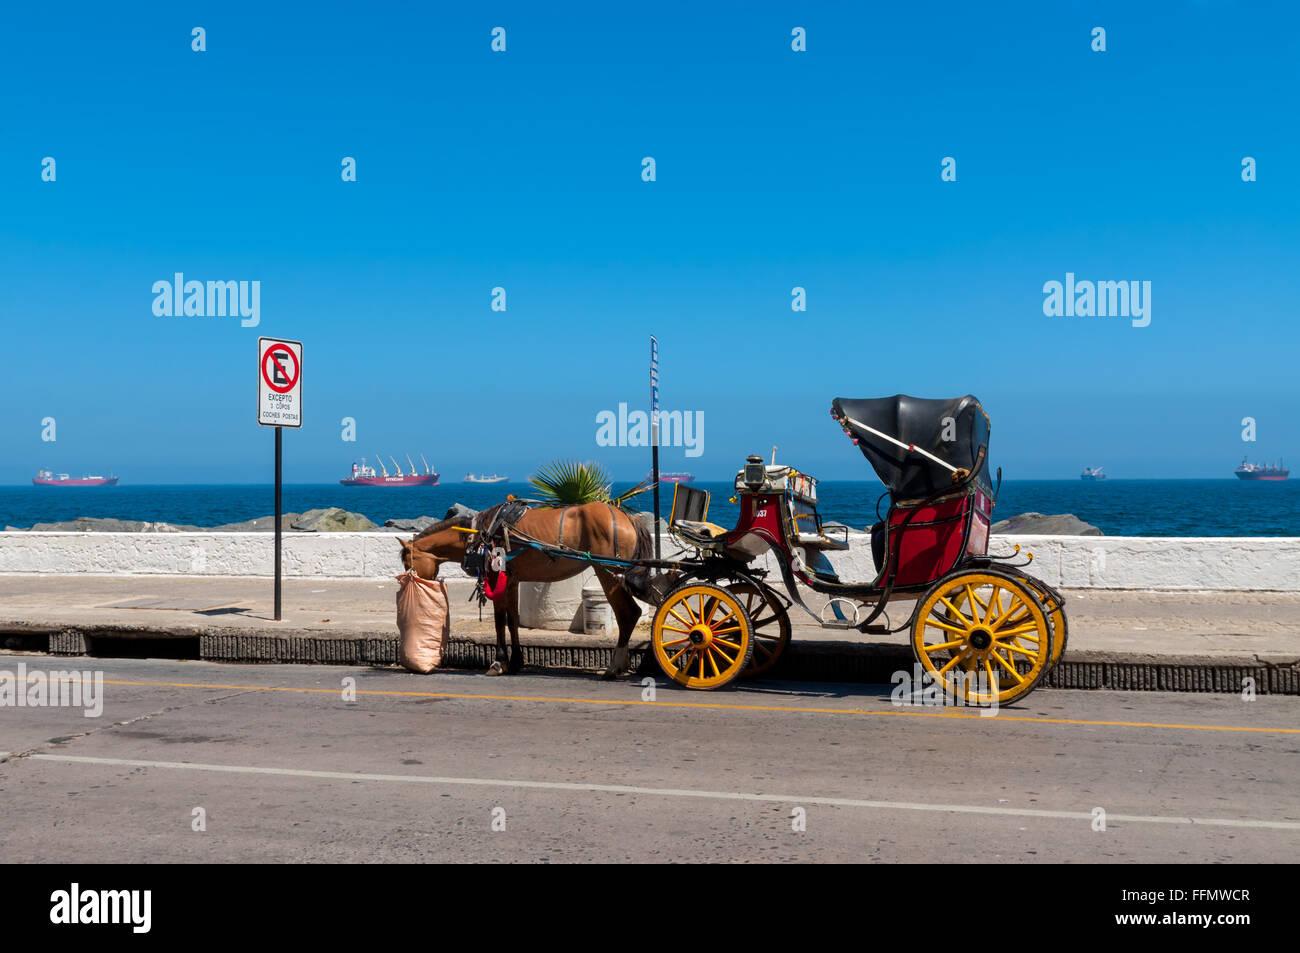 A tourist transport through the city. Vina del Mar, Chile - Stock Image